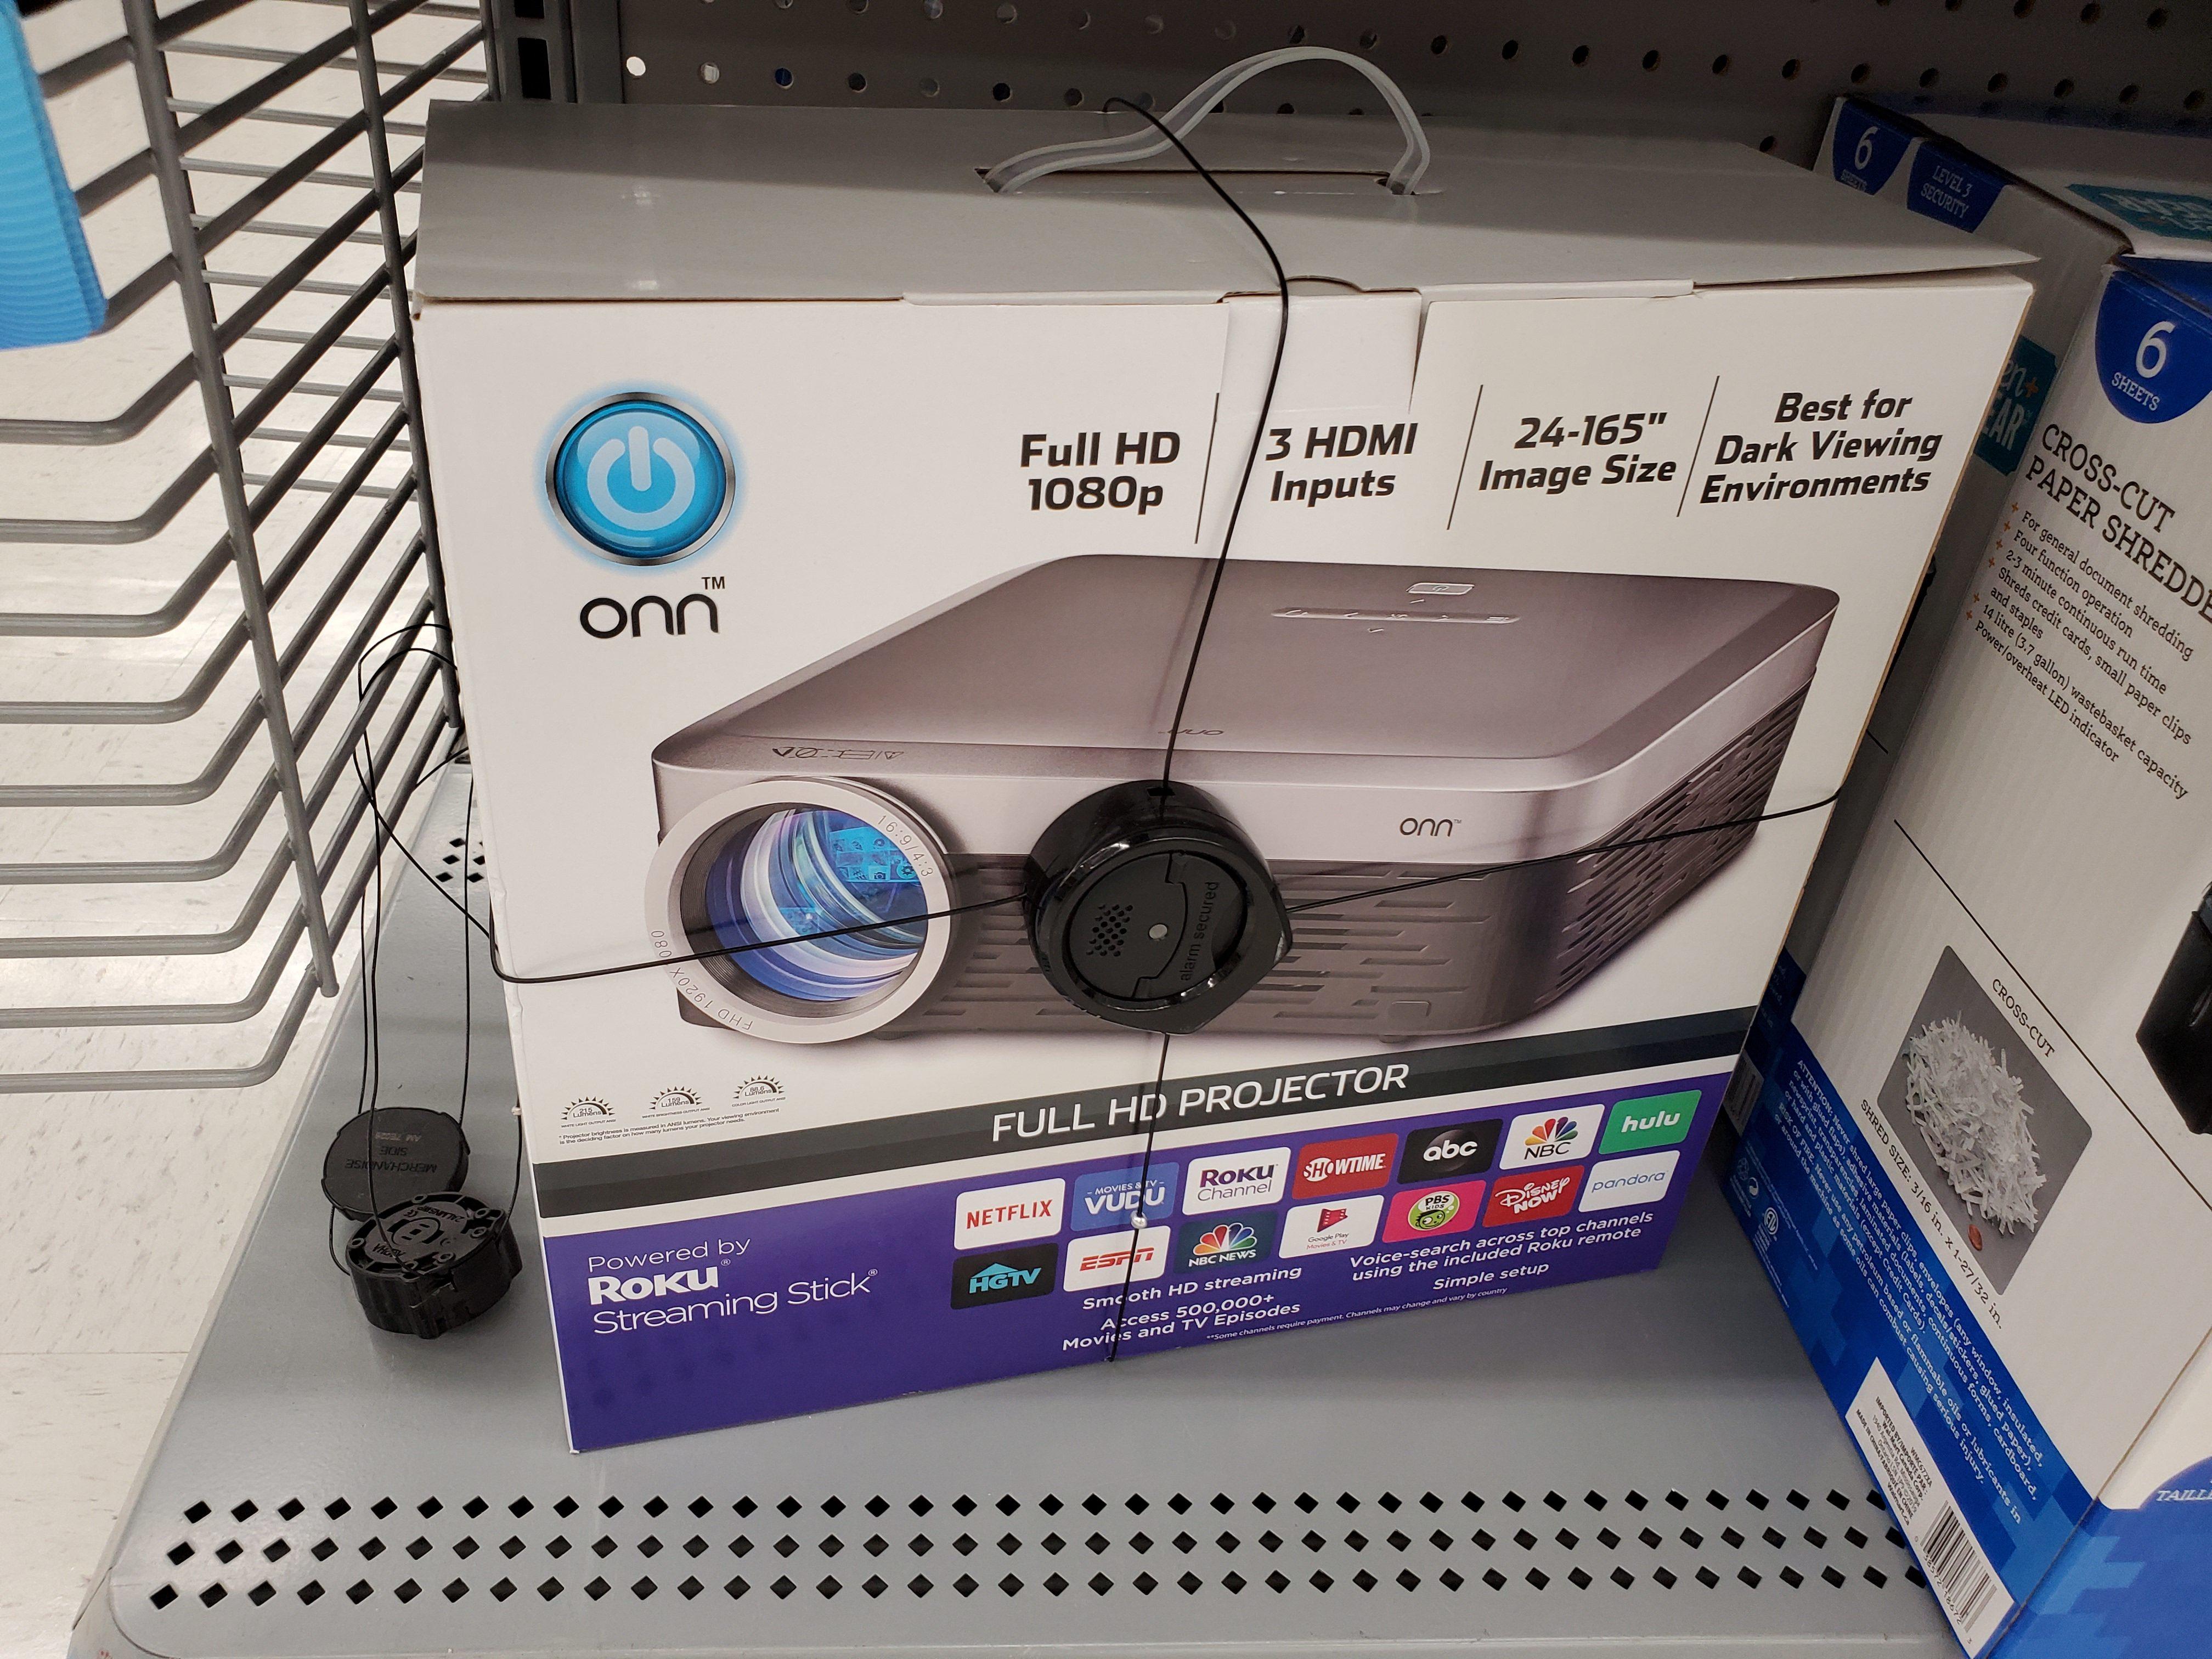 Projector onn roku Brand New